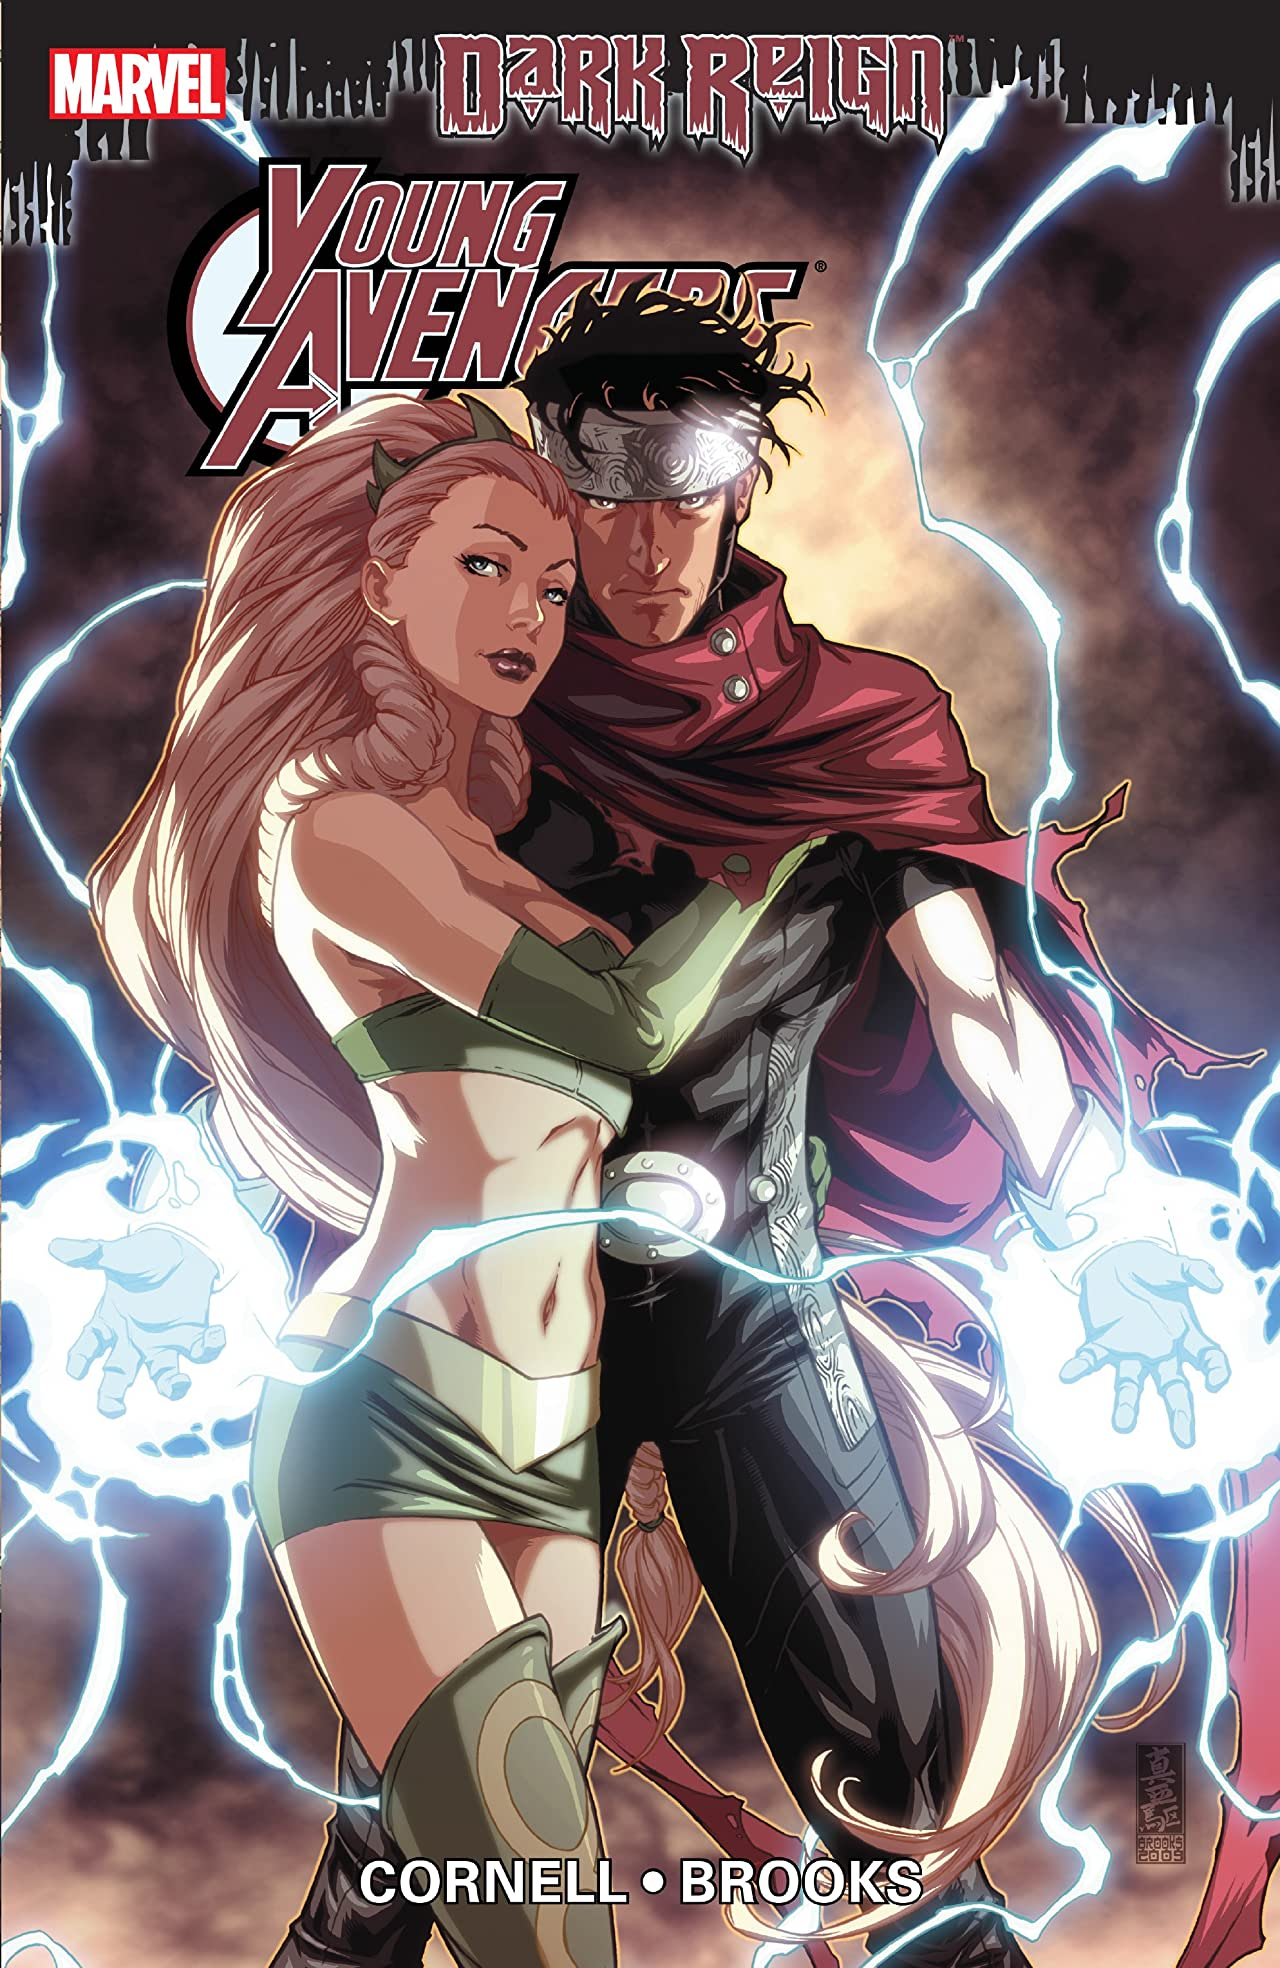 Dark Reign: Young Avengers